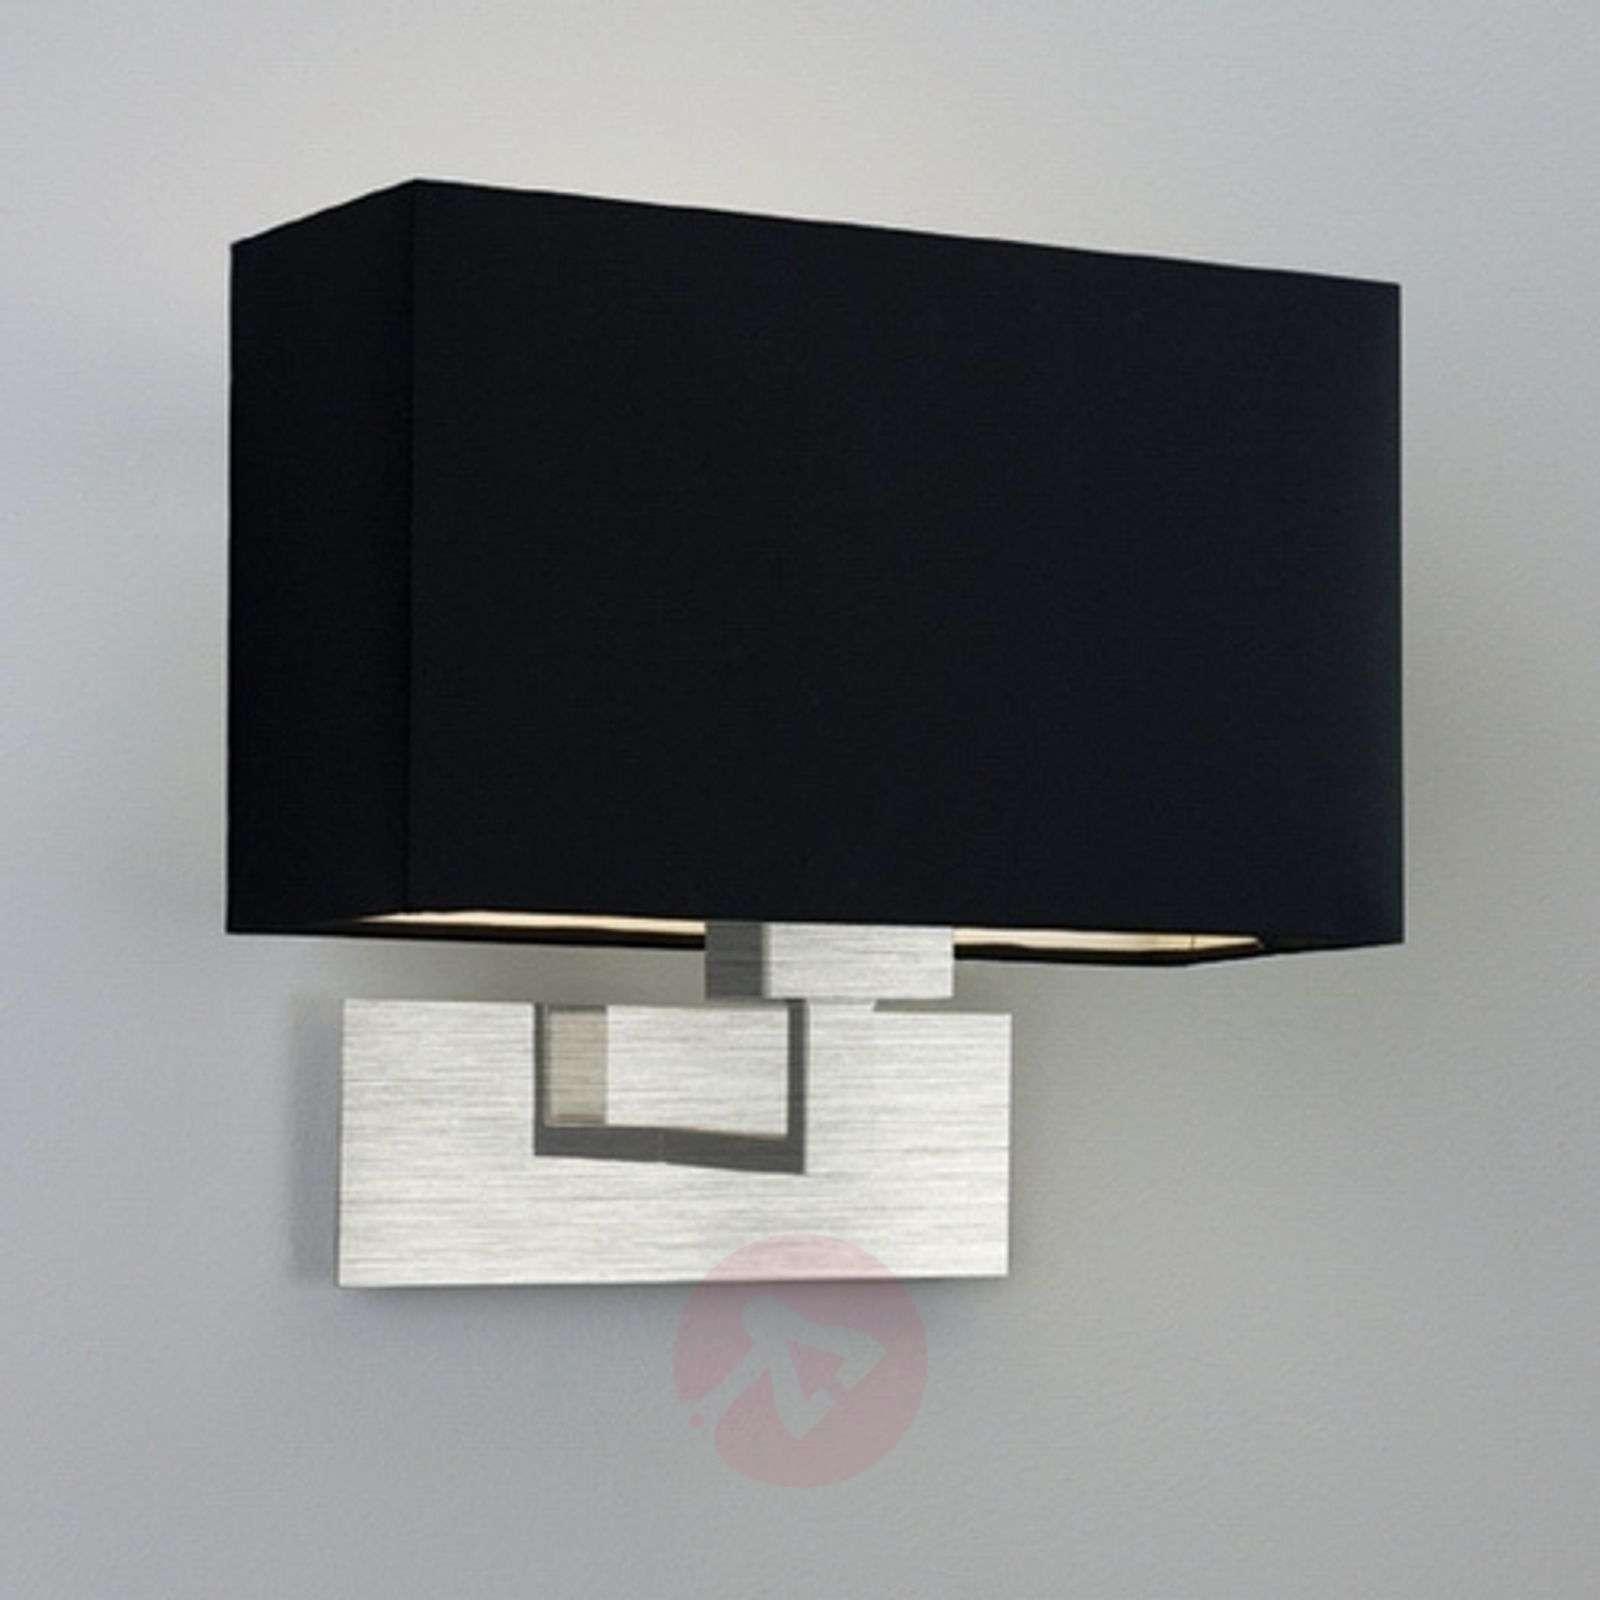 Elegantti PARK LANE GRANDE-seinävalaisin, musta-1020174-01